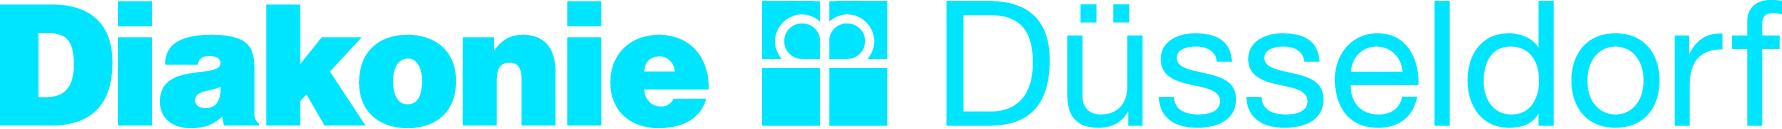 Logo_Diakonie_Duesseldorf_blau_05-CMYK.jpg